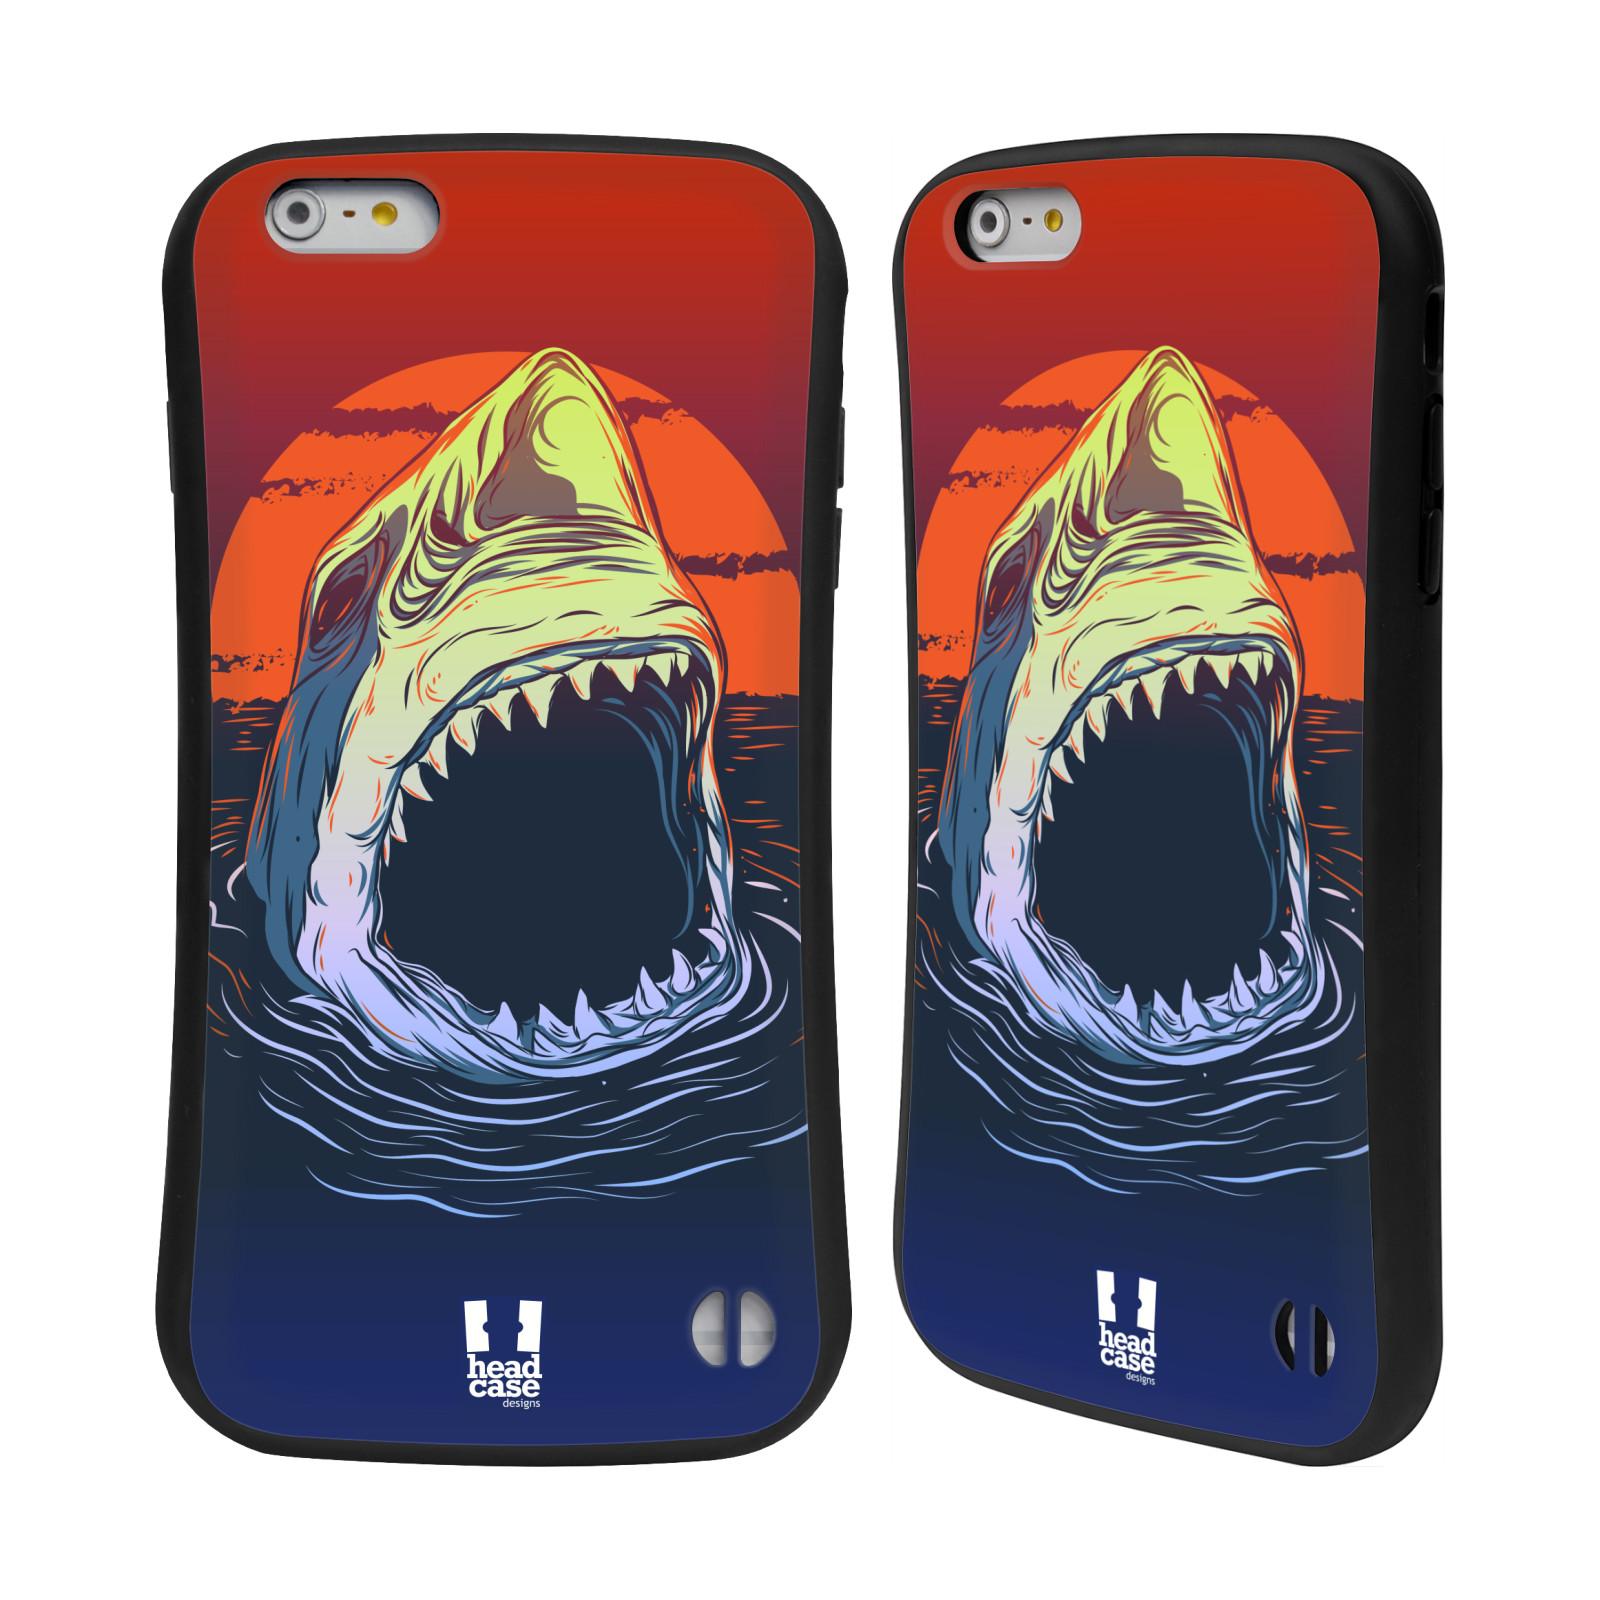 HEAD CASE silikon/plast odolný obal na mobil Apple Iphone 6 PLUS / 6S PLUS vzor mořská monstra žralok